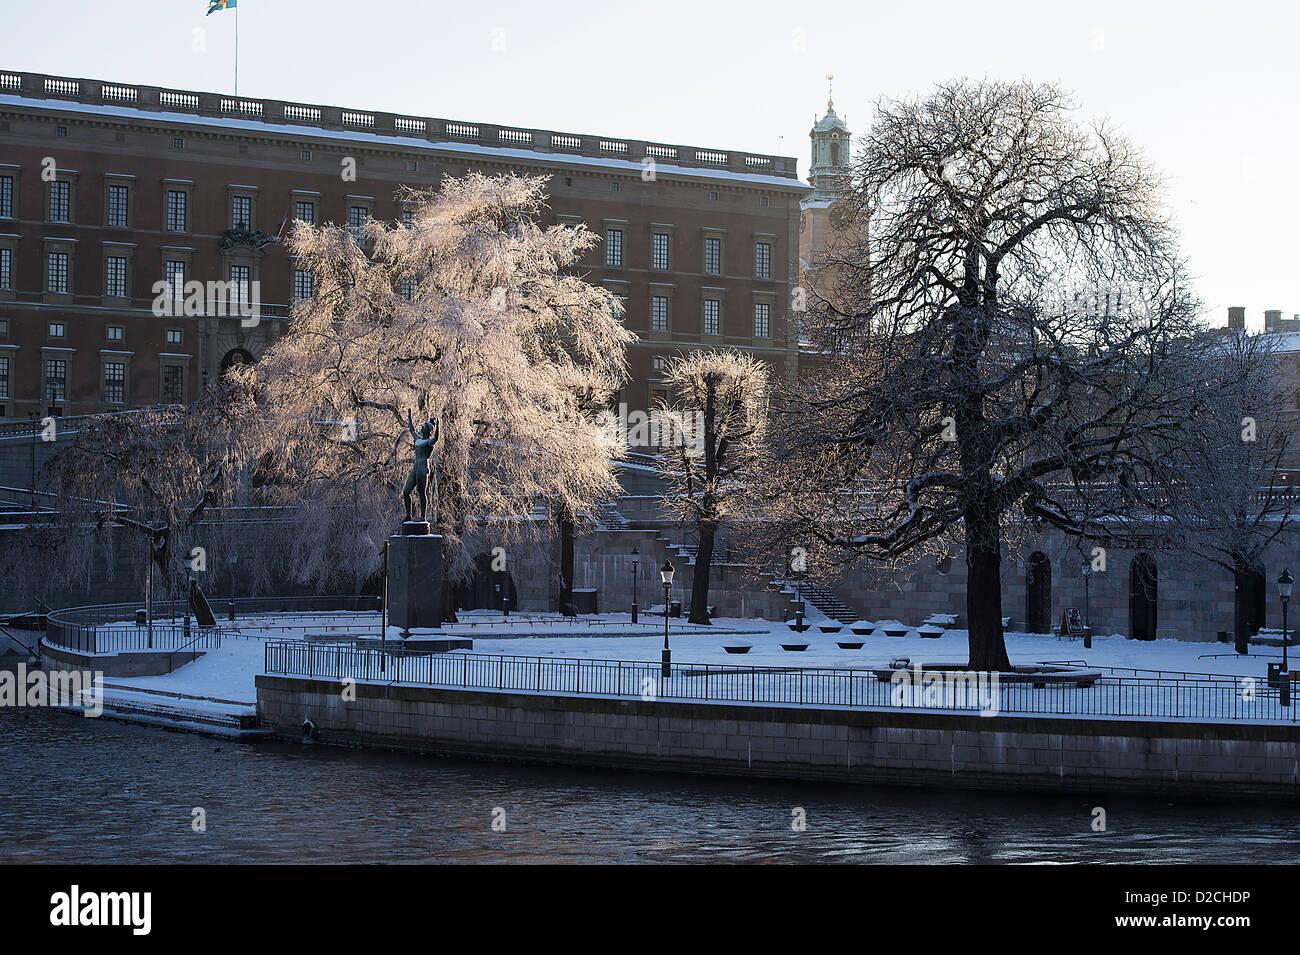 Frosty tree Roya Palace Stockholm Sweden - Stock Image